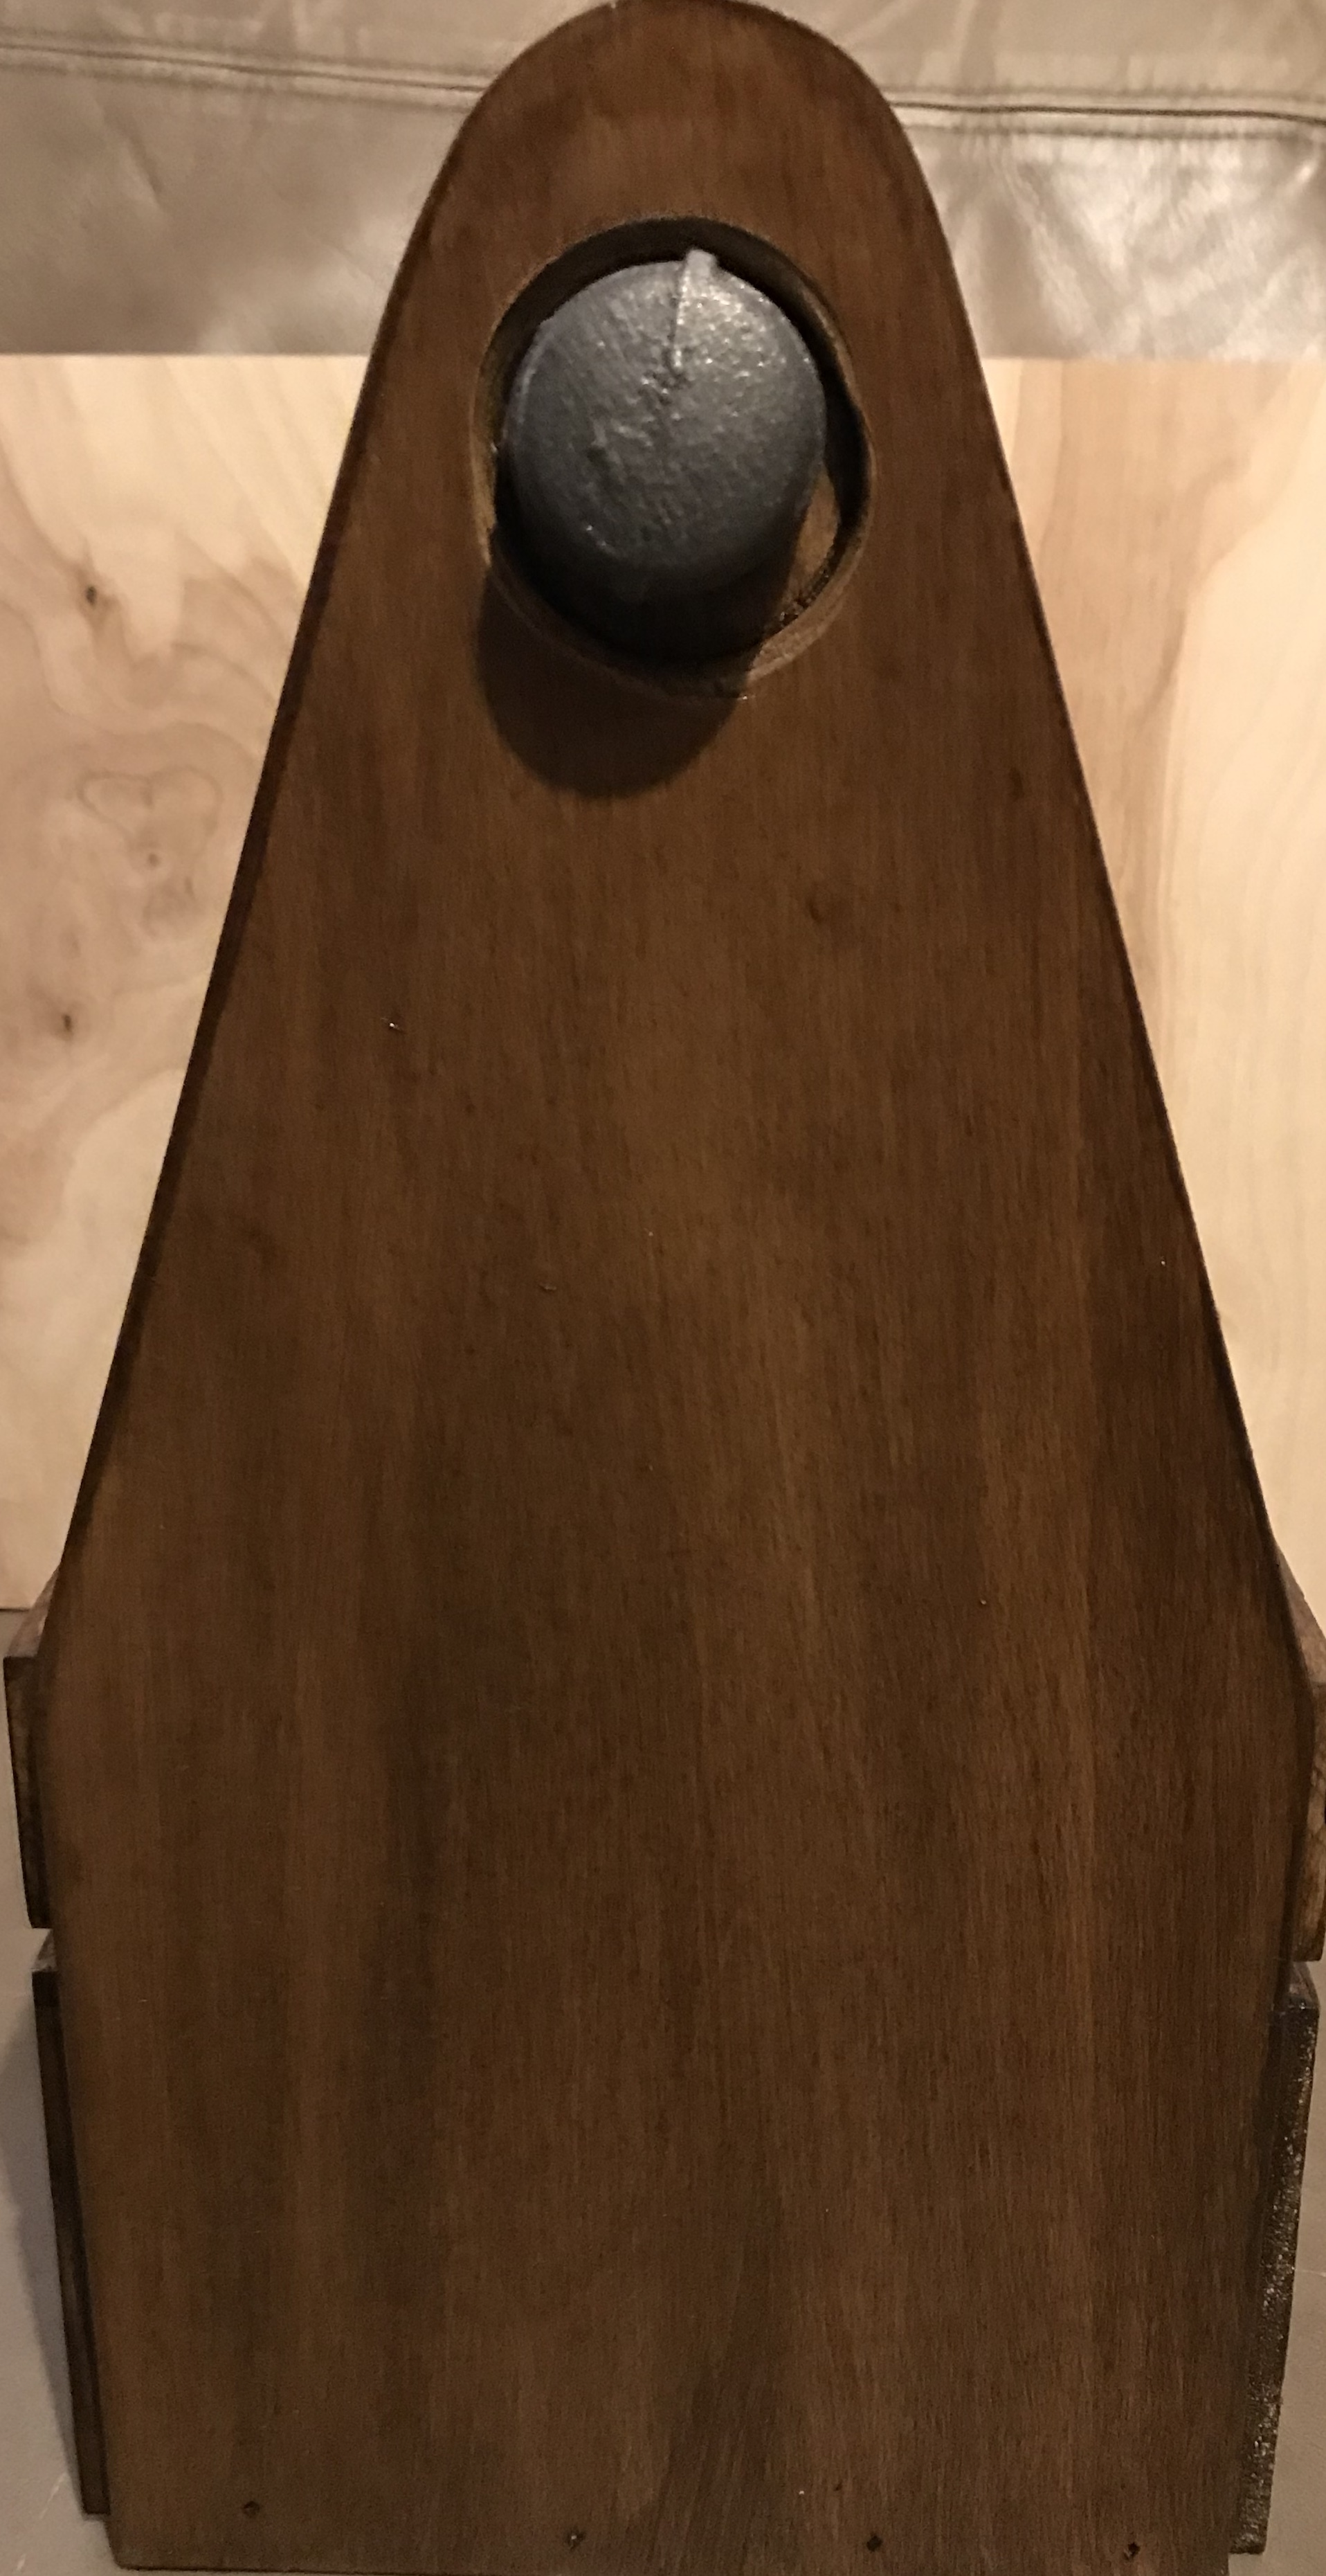 Handcrafted Wood Beverage Carrier